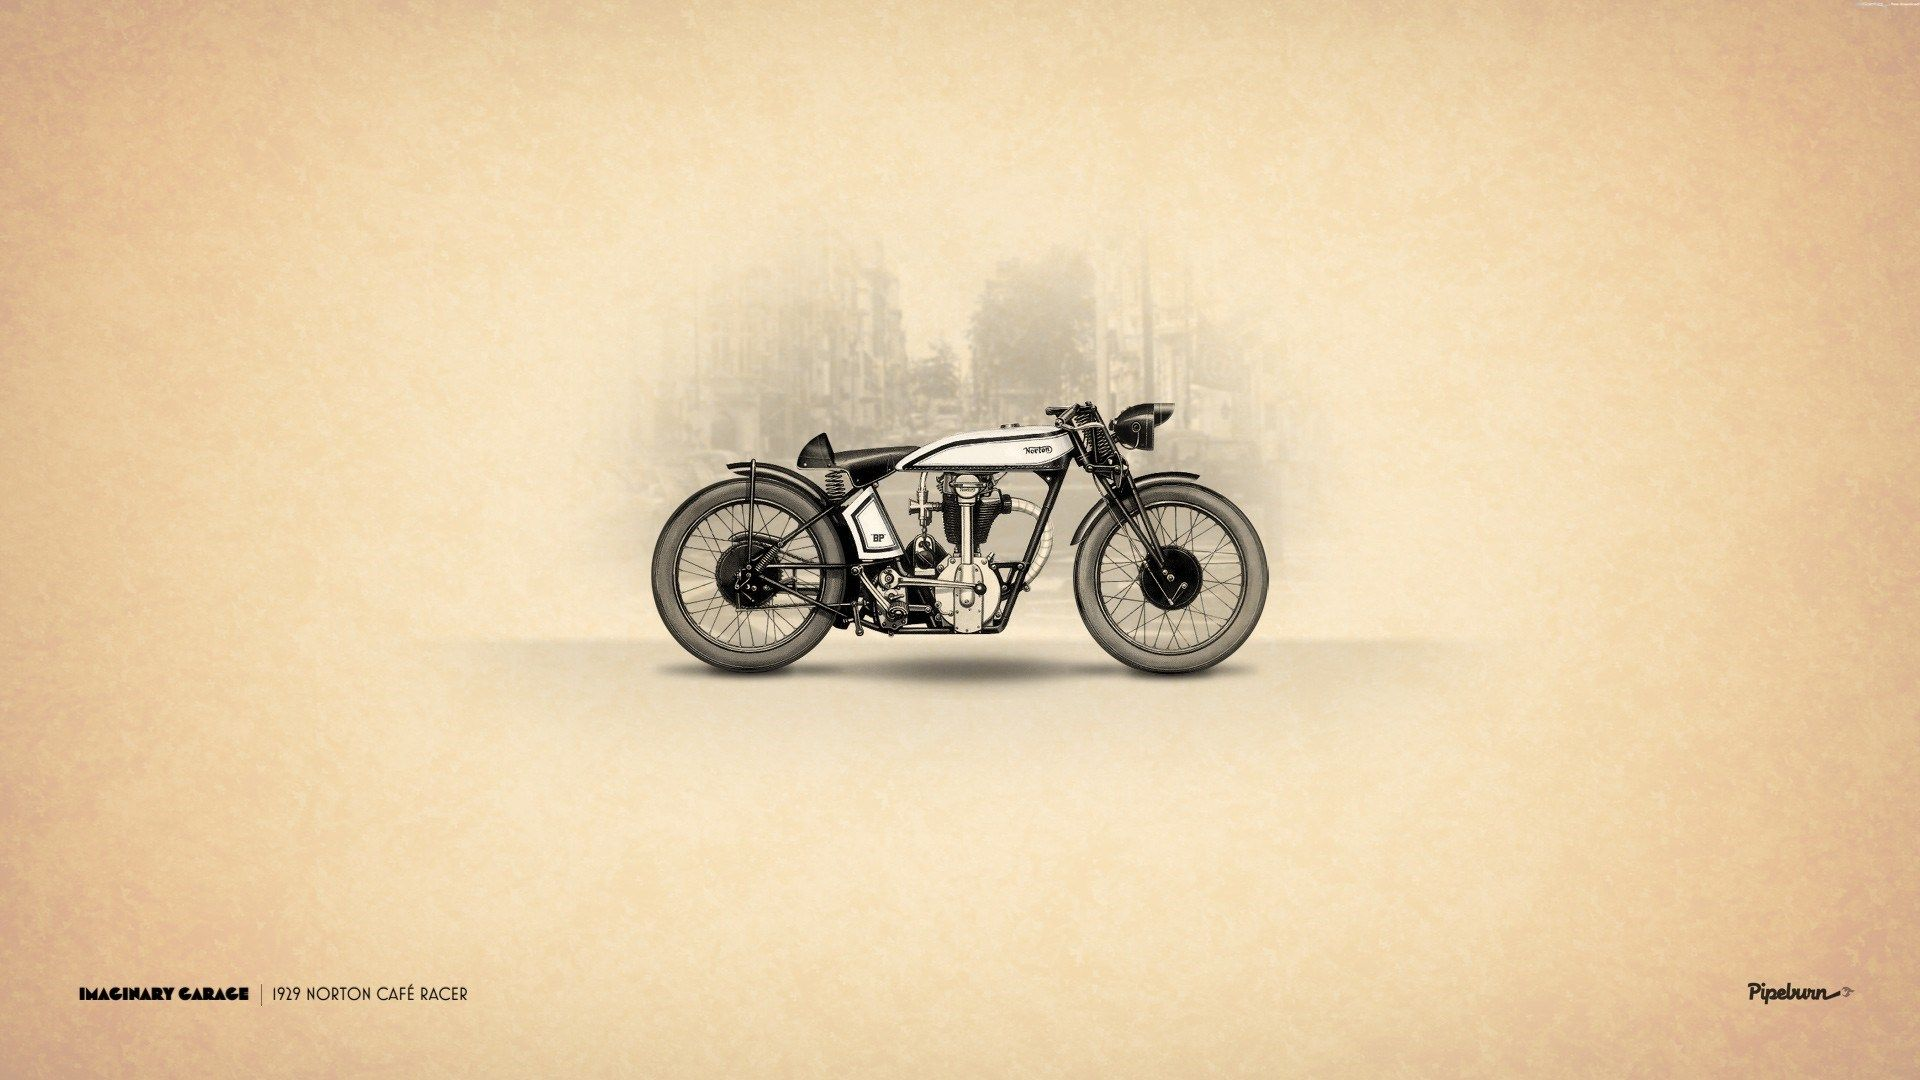 Hd wallpaper art - Vintage Motorbike Art Norton Cafe Racer Hd Wallpaper Zoomwalls Vintage Pinterest Wallpaper Motorcycle Wallpaper And Motorbikes